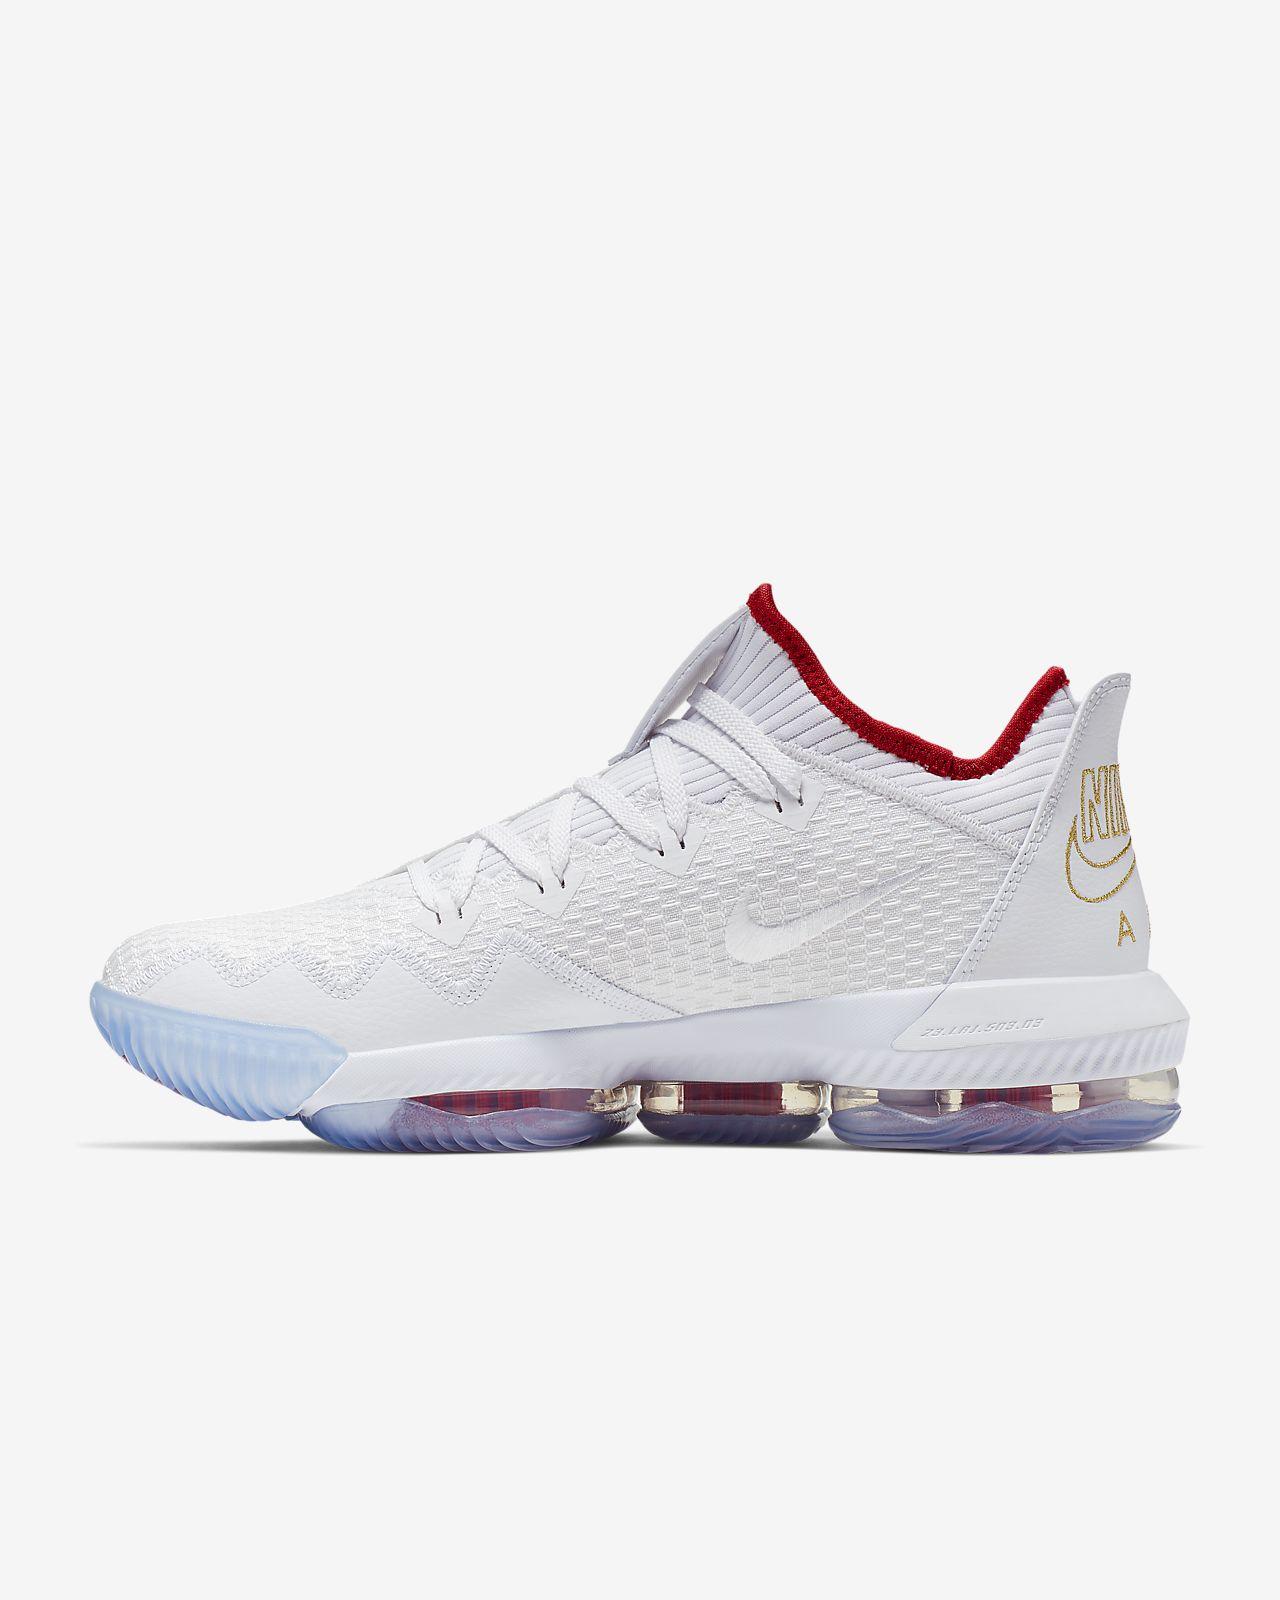 watch 8333a f9c57 ... LeBron 16 Low Basketball Shoe